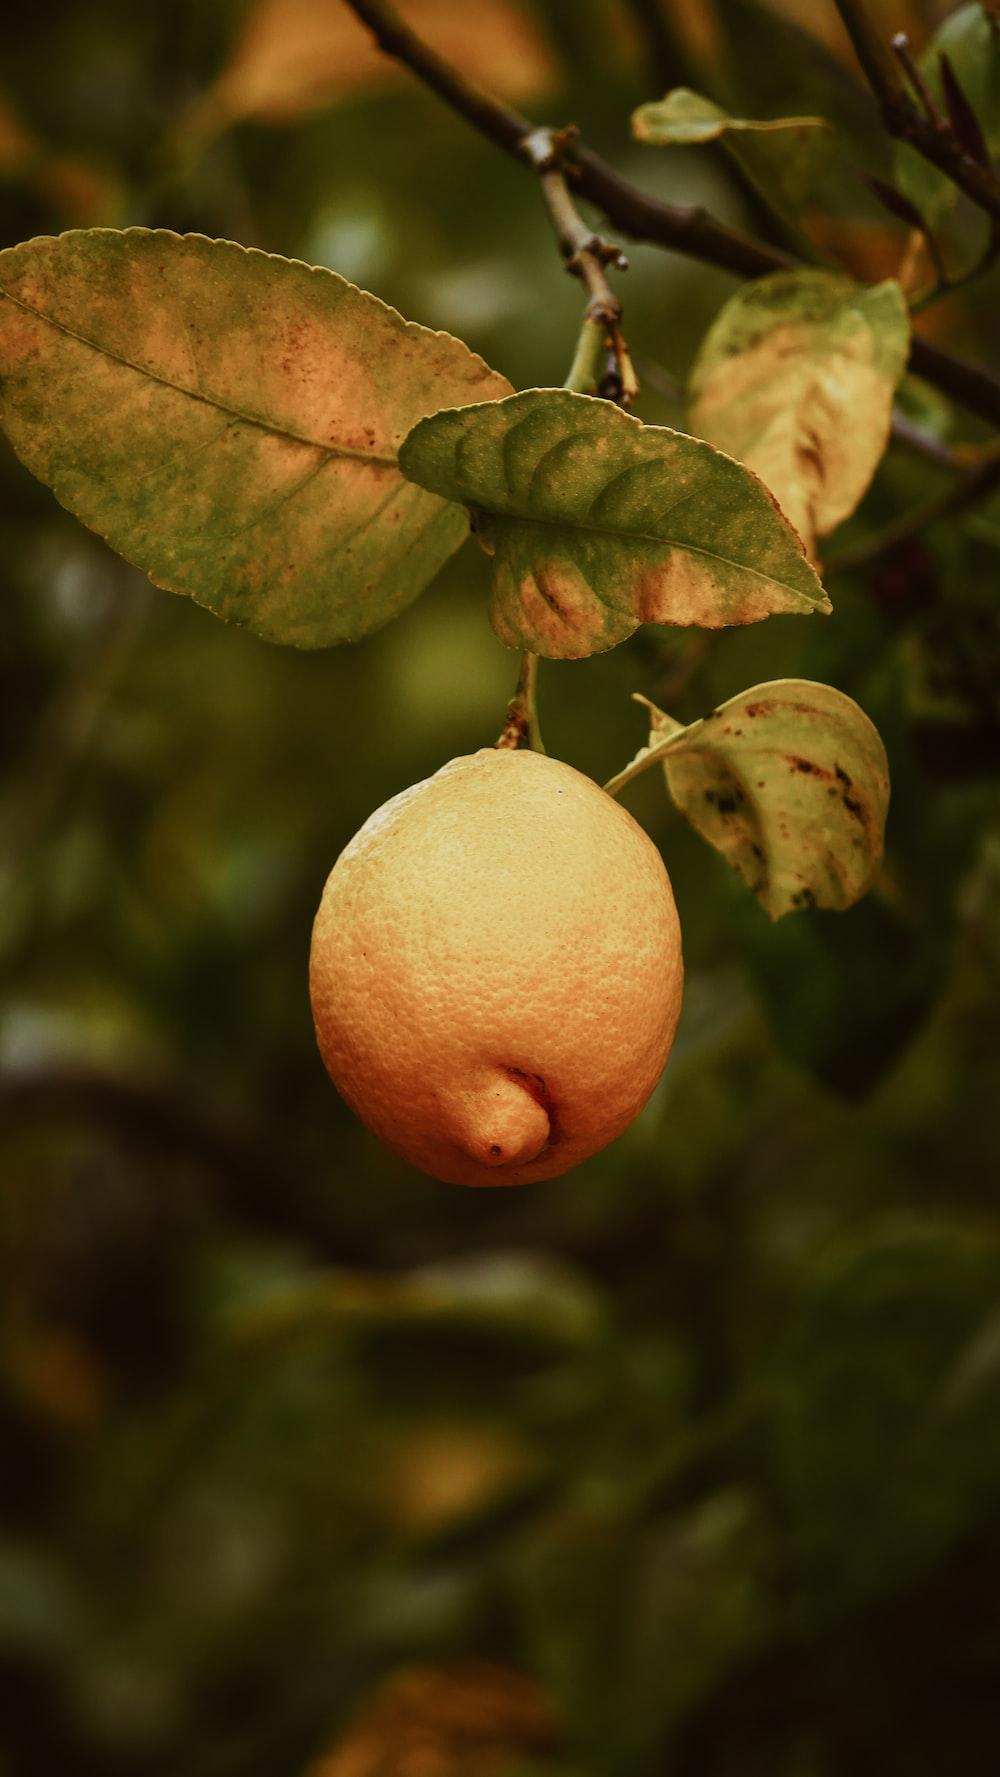 orange fruit growing on tree